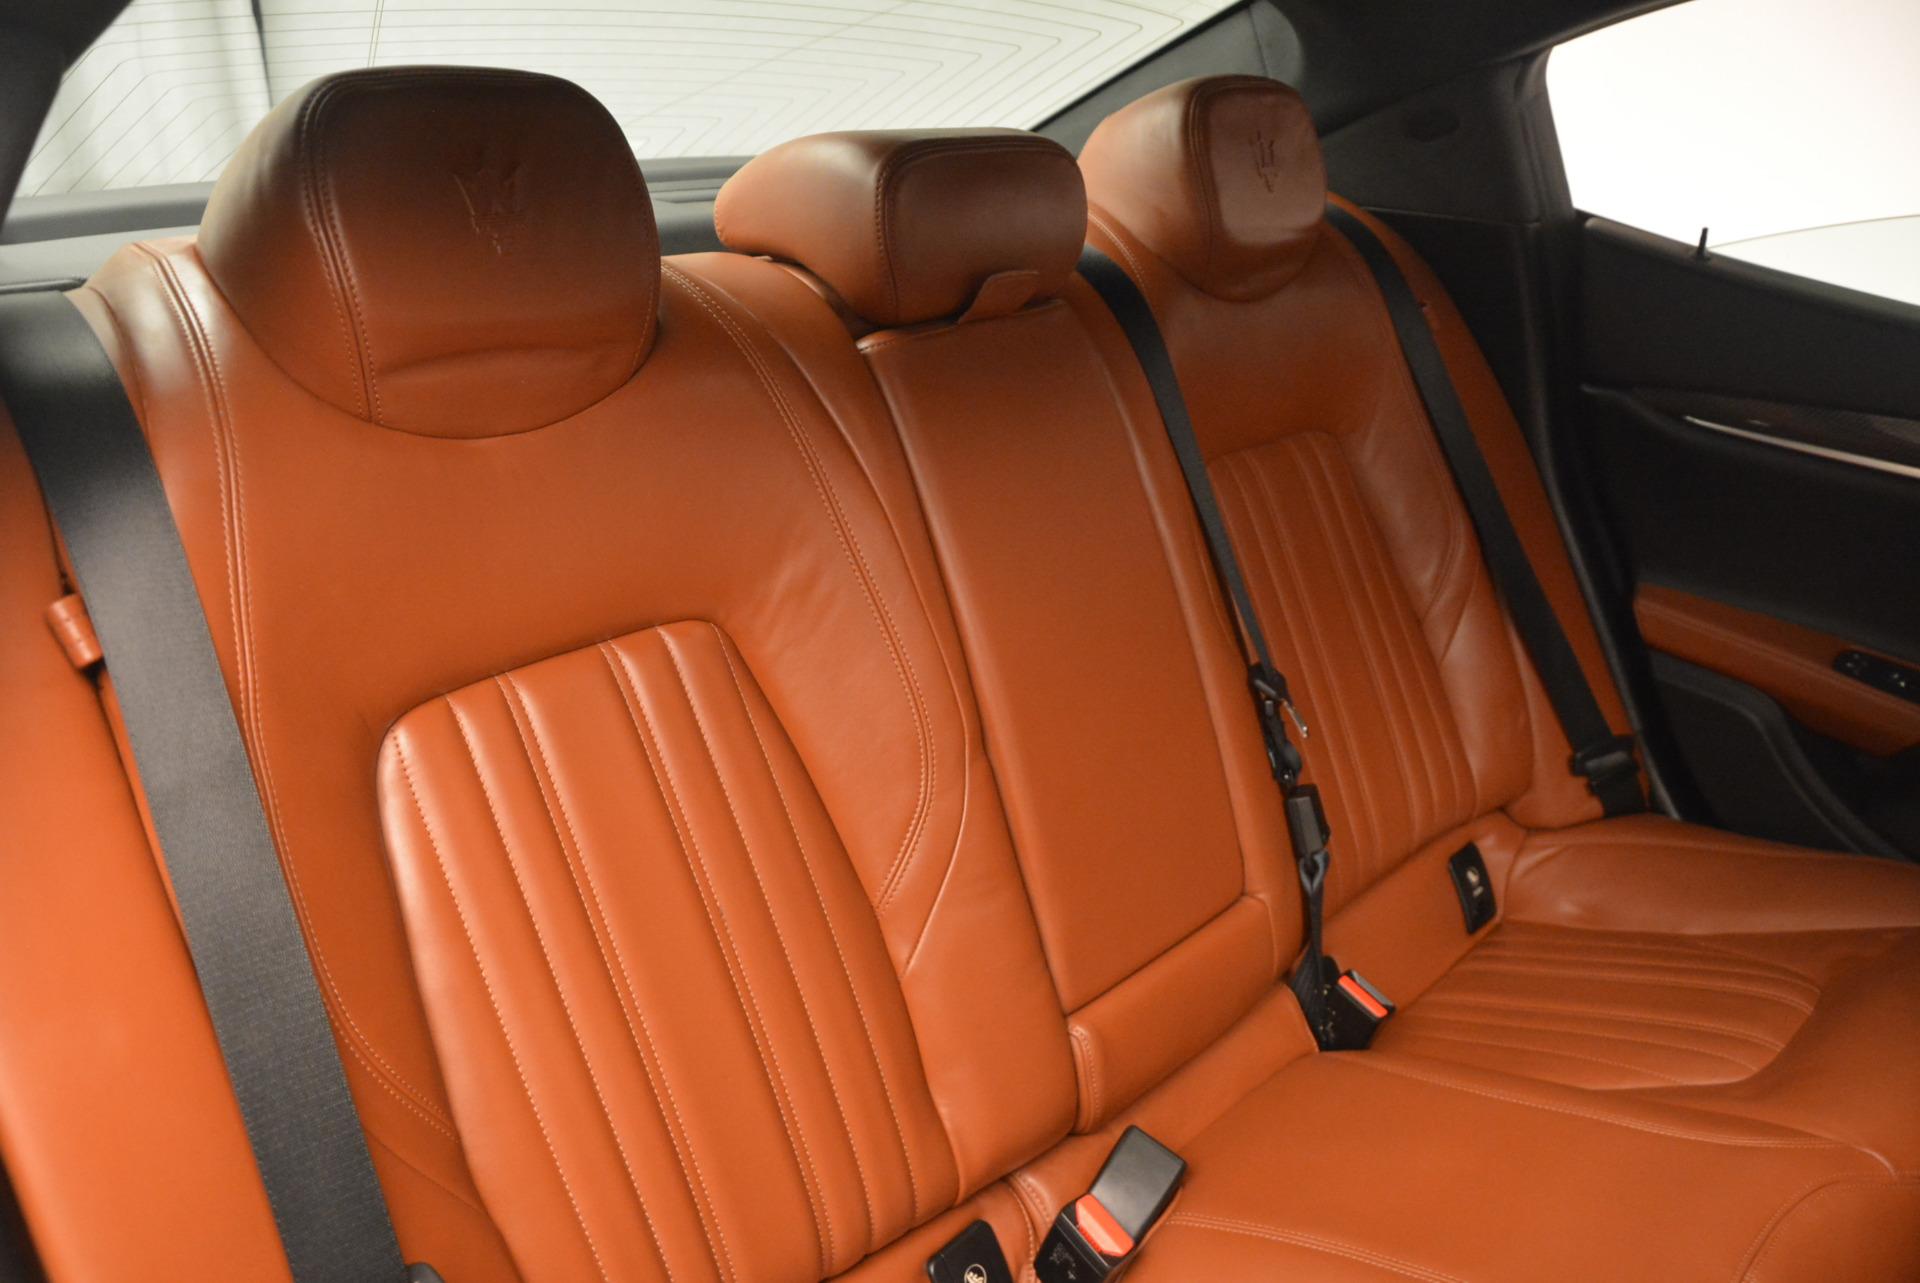 Used 2014 Maserati Ghibli S Q4 For Sale In Greenwich, CT 805_p25